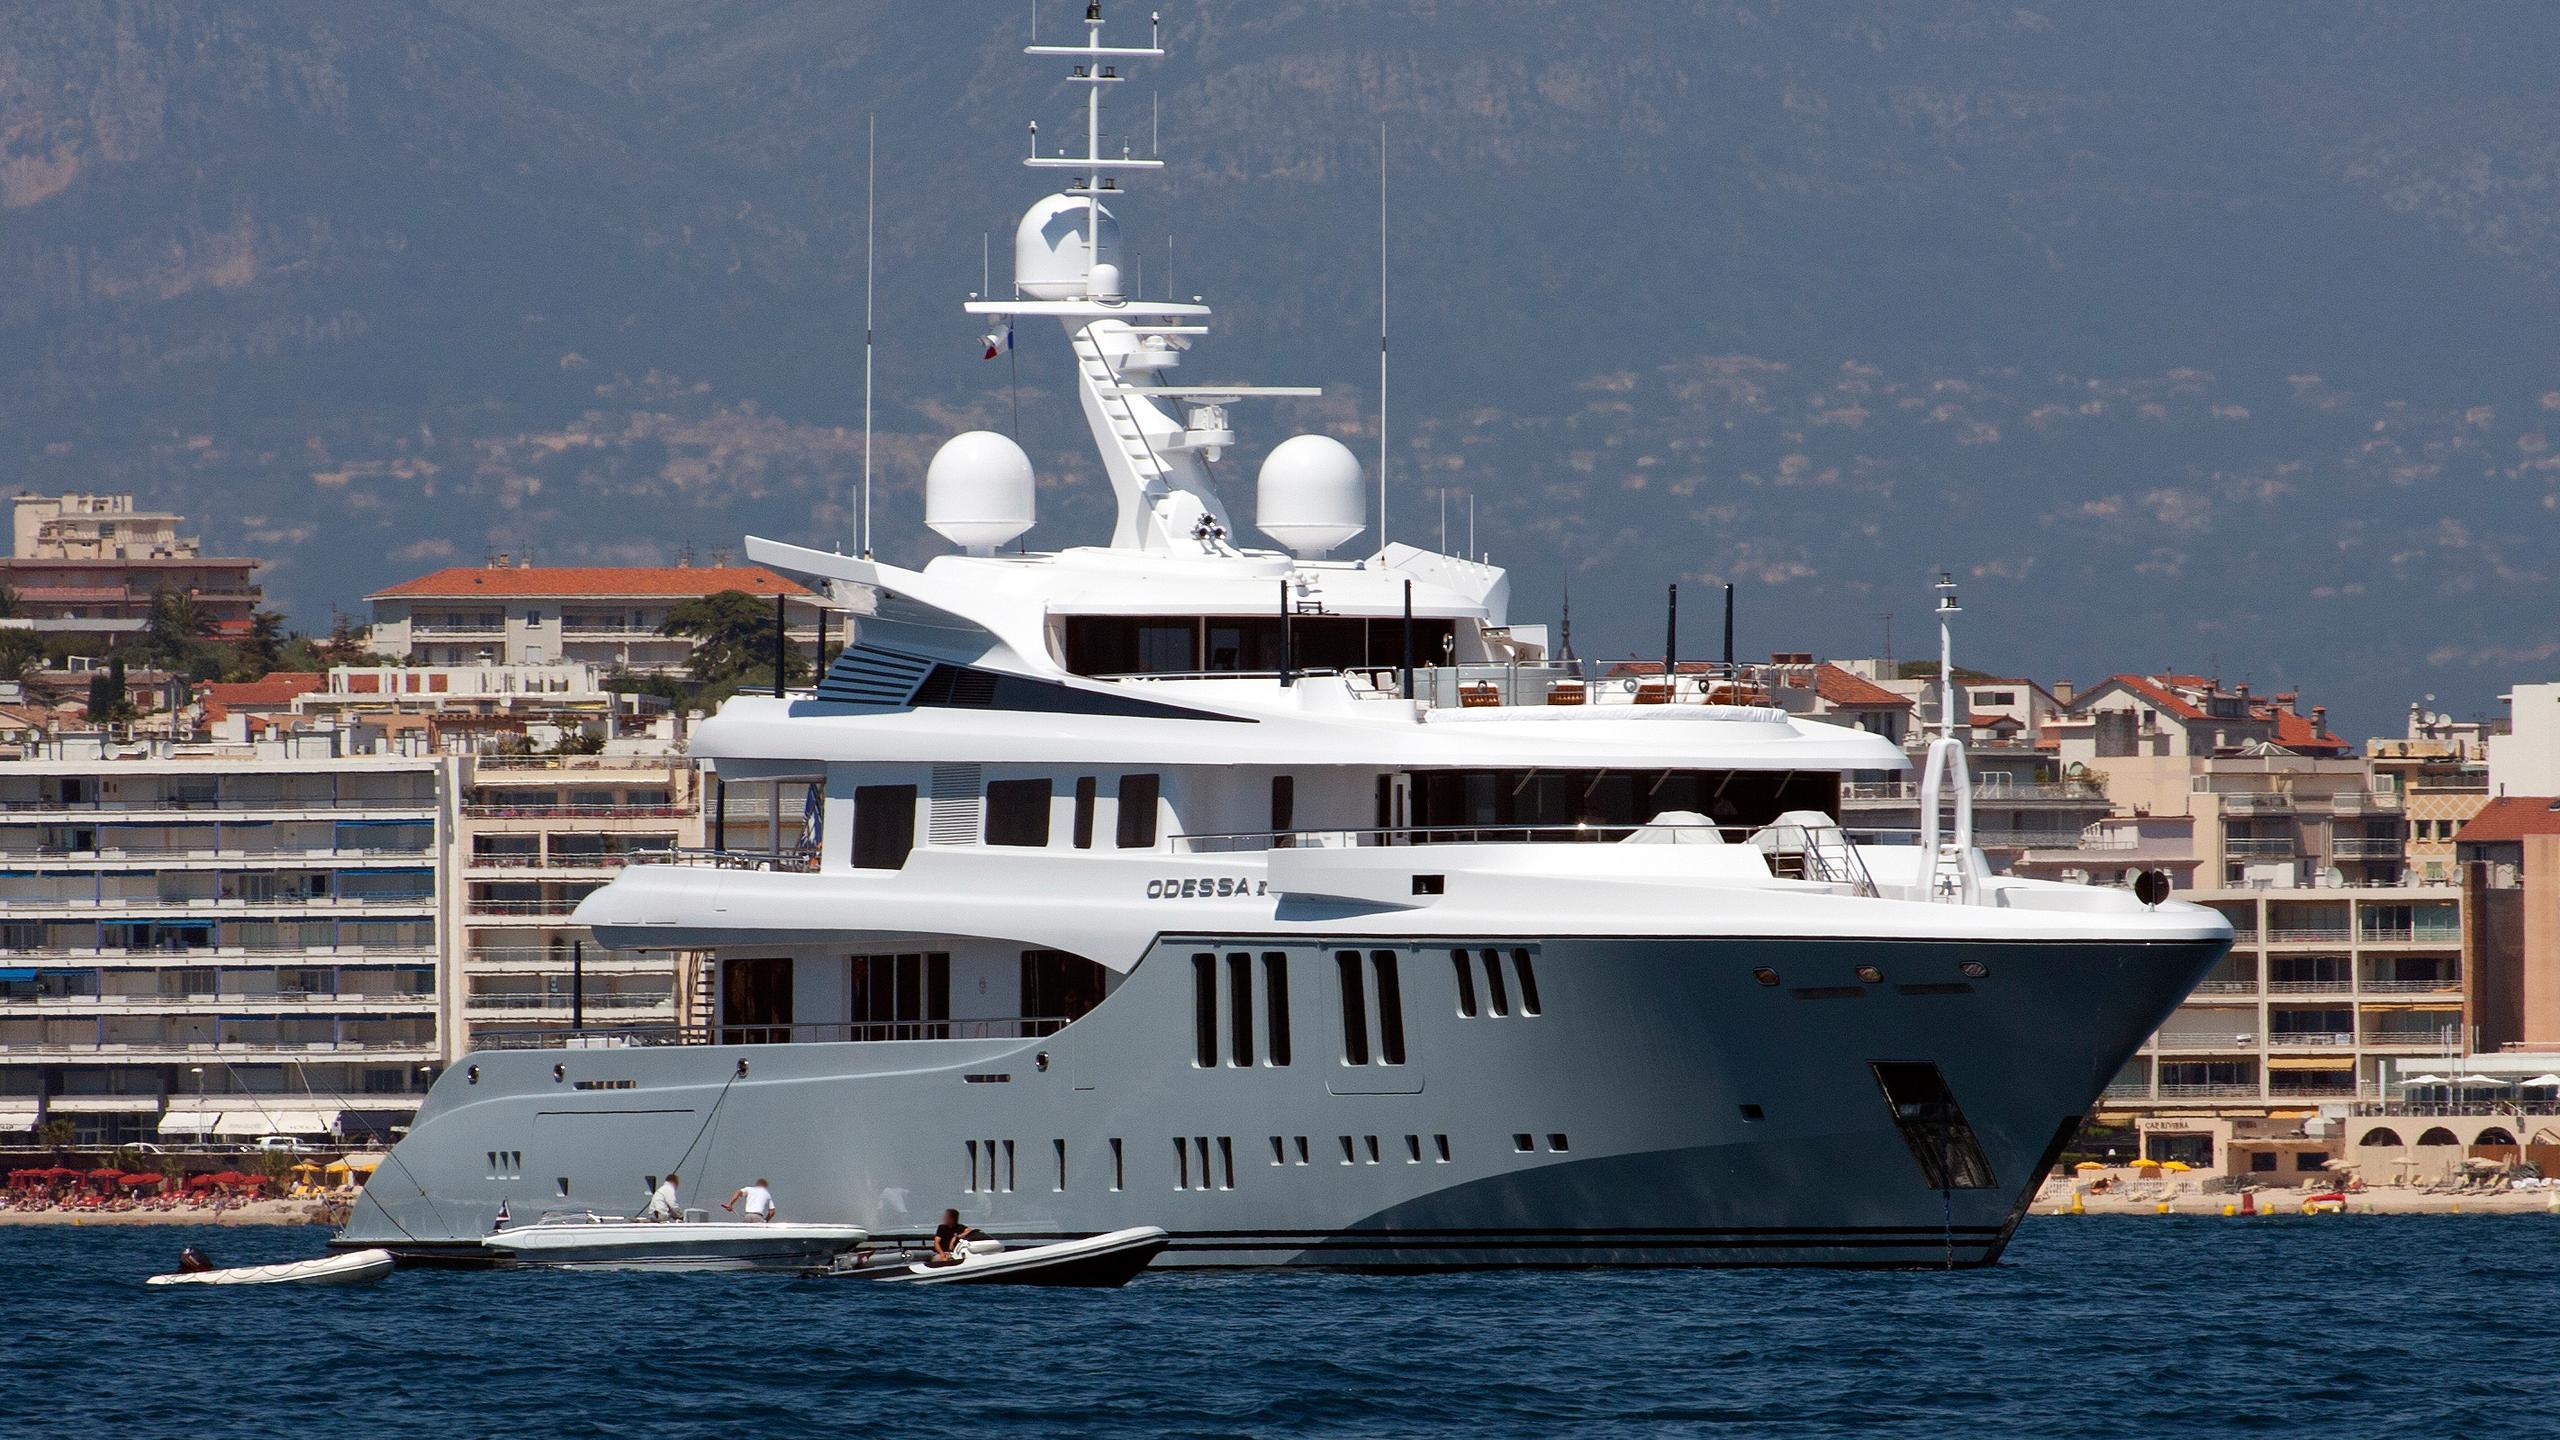 odessa-ii-motor-yacht-nobiskrug-2013-73m-profile-bow